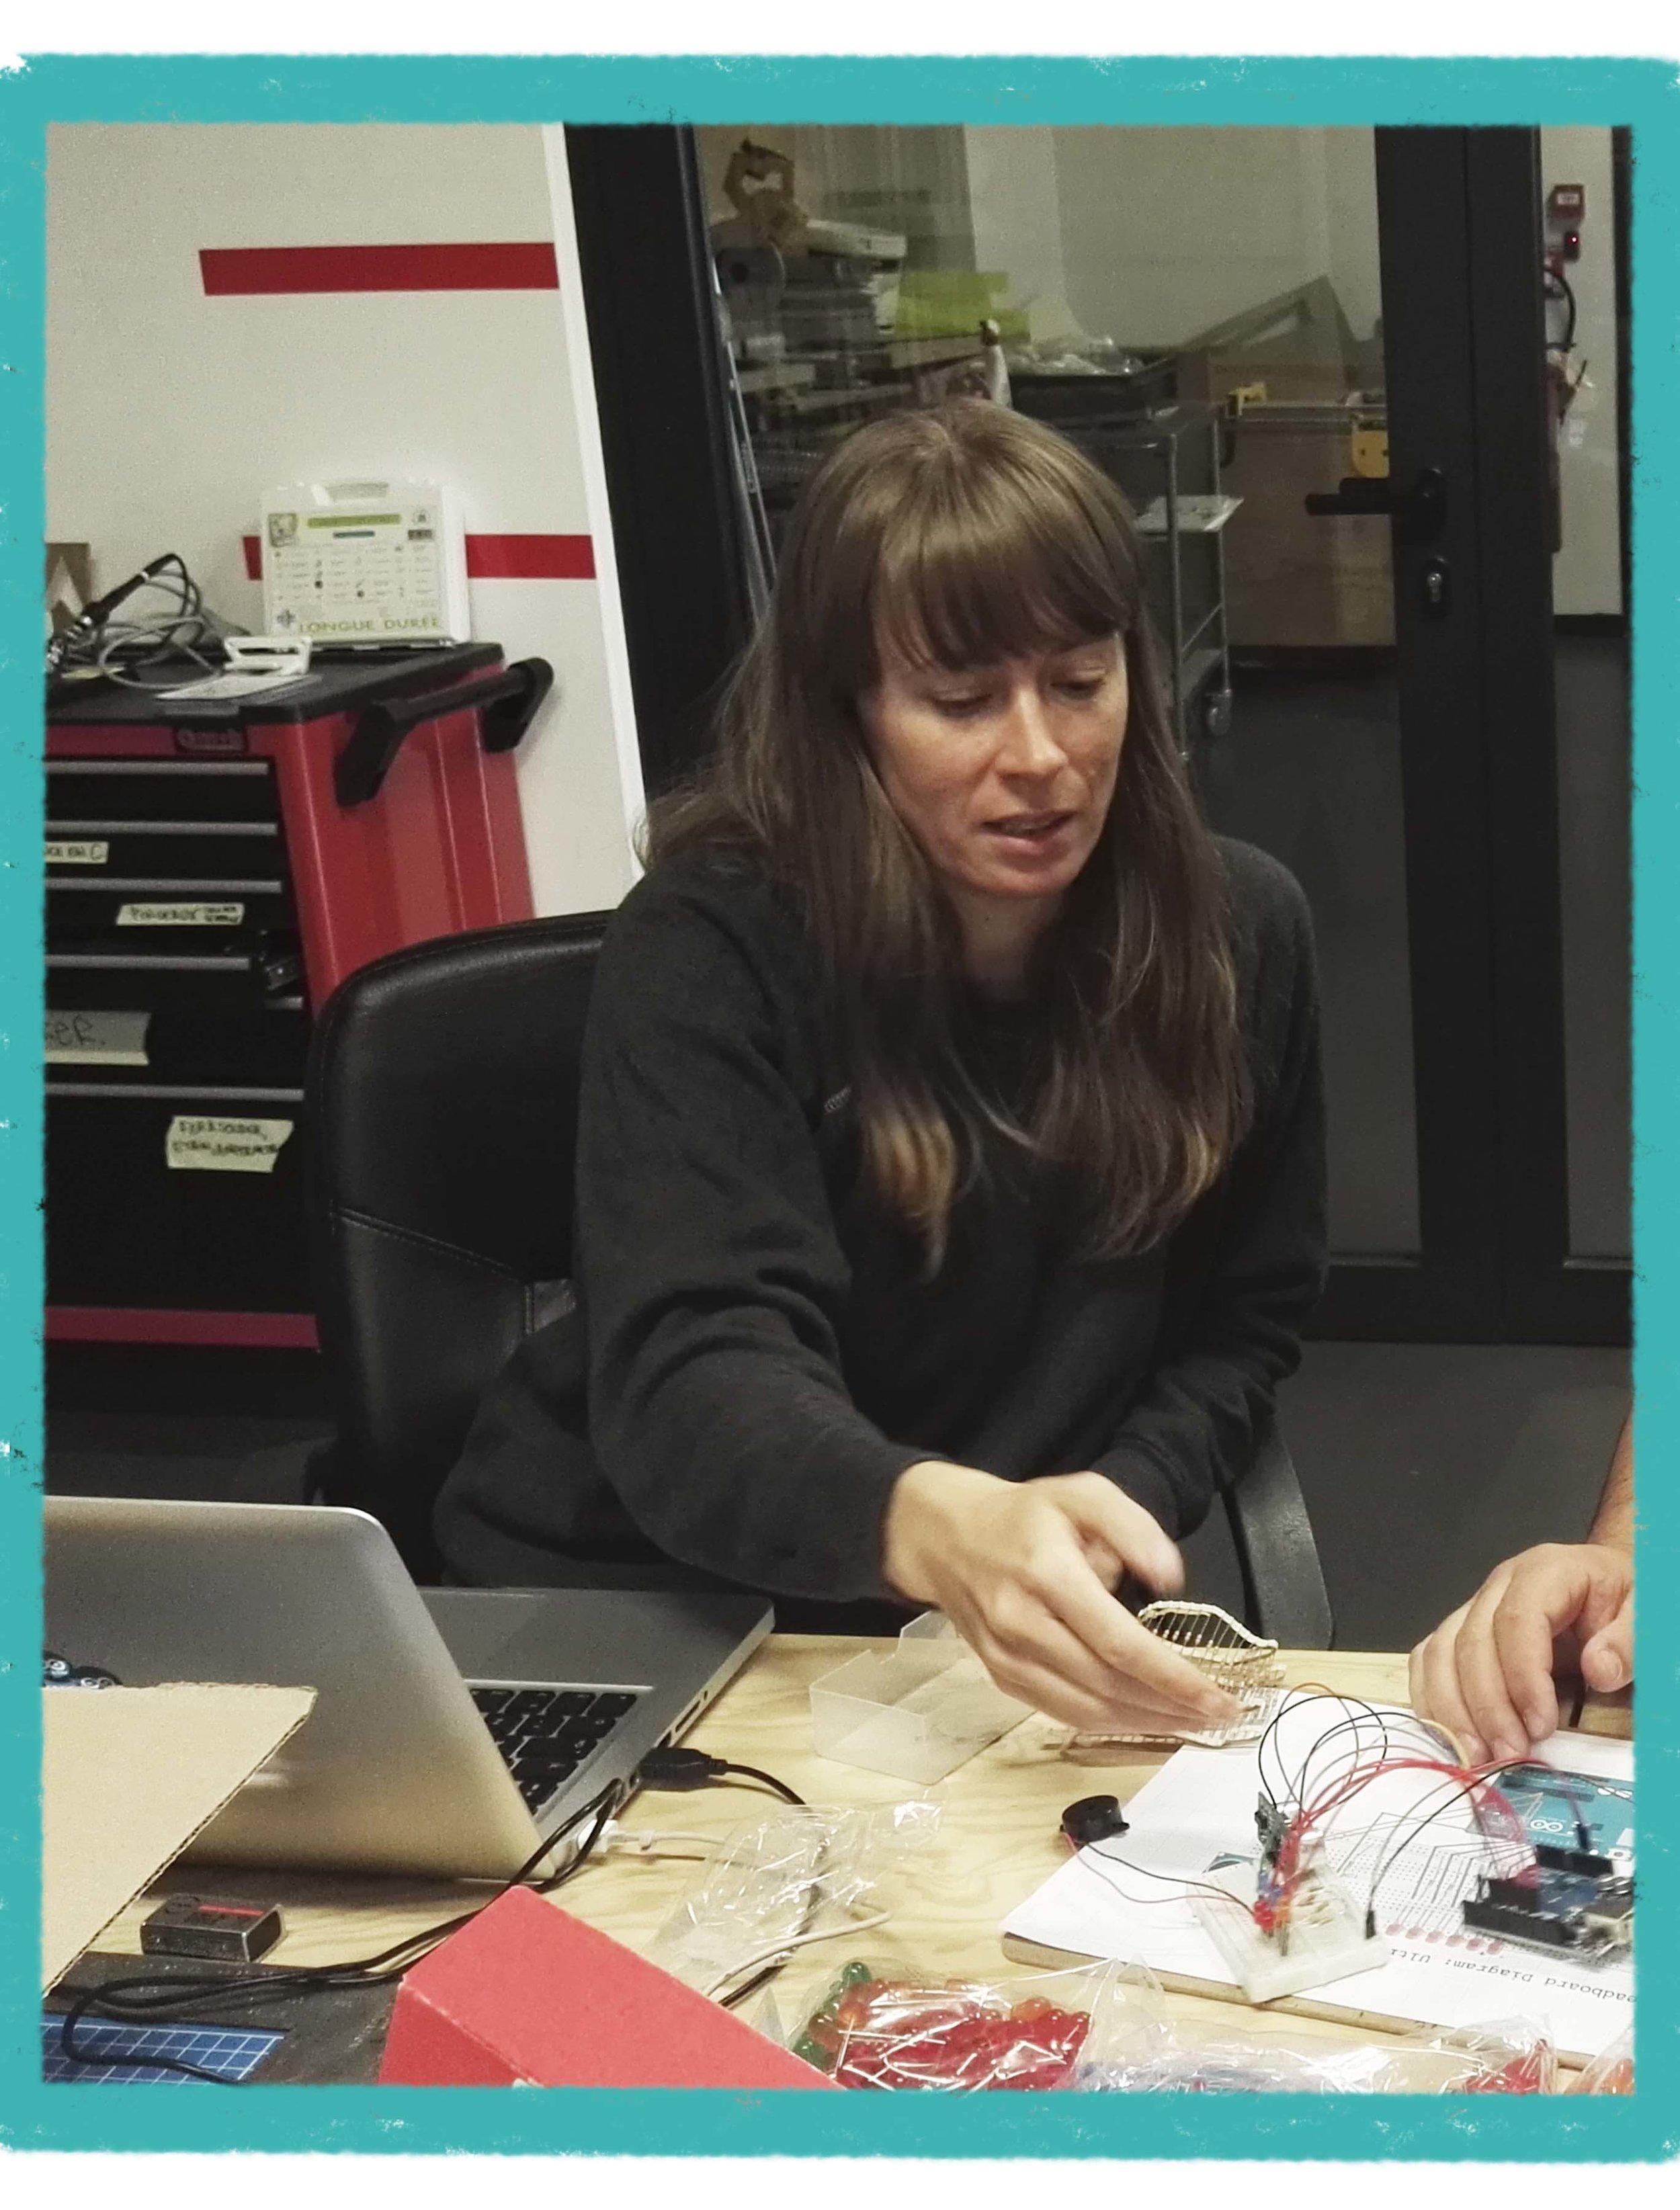 kate_delaney-make-create-innovate